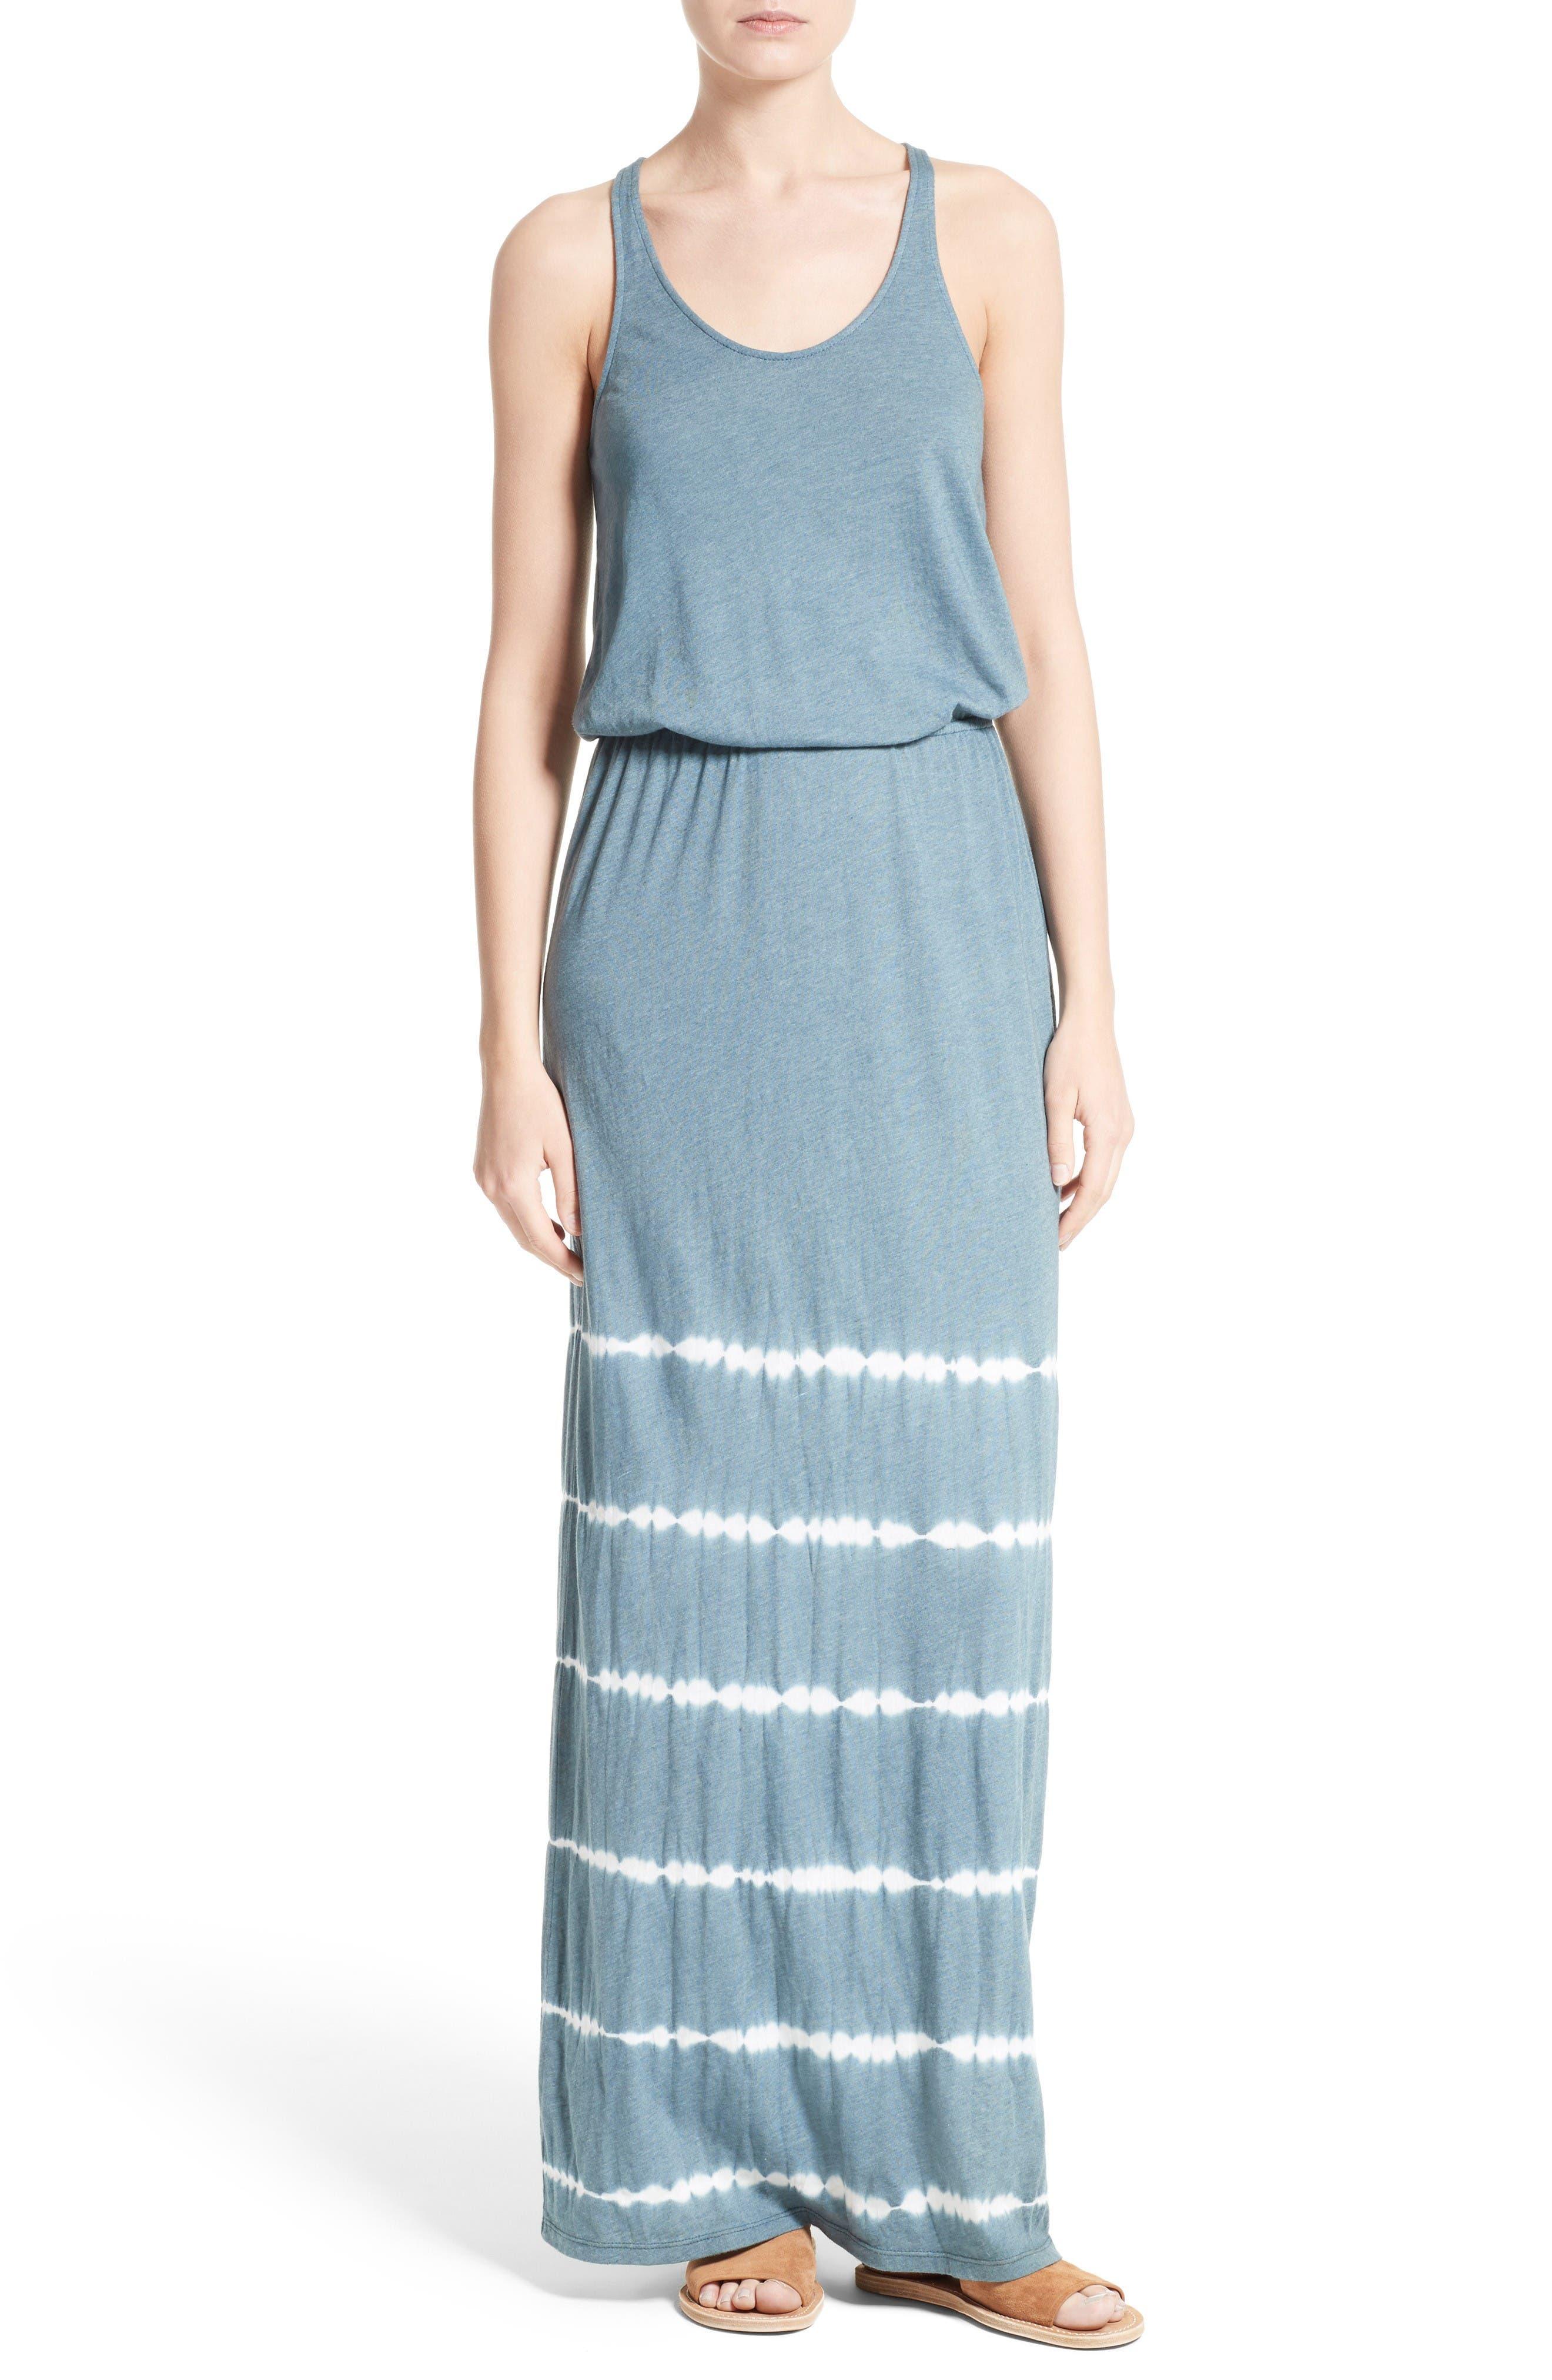 Soft Joie Ljiljana Tie Dye Jersey Maxi Dress